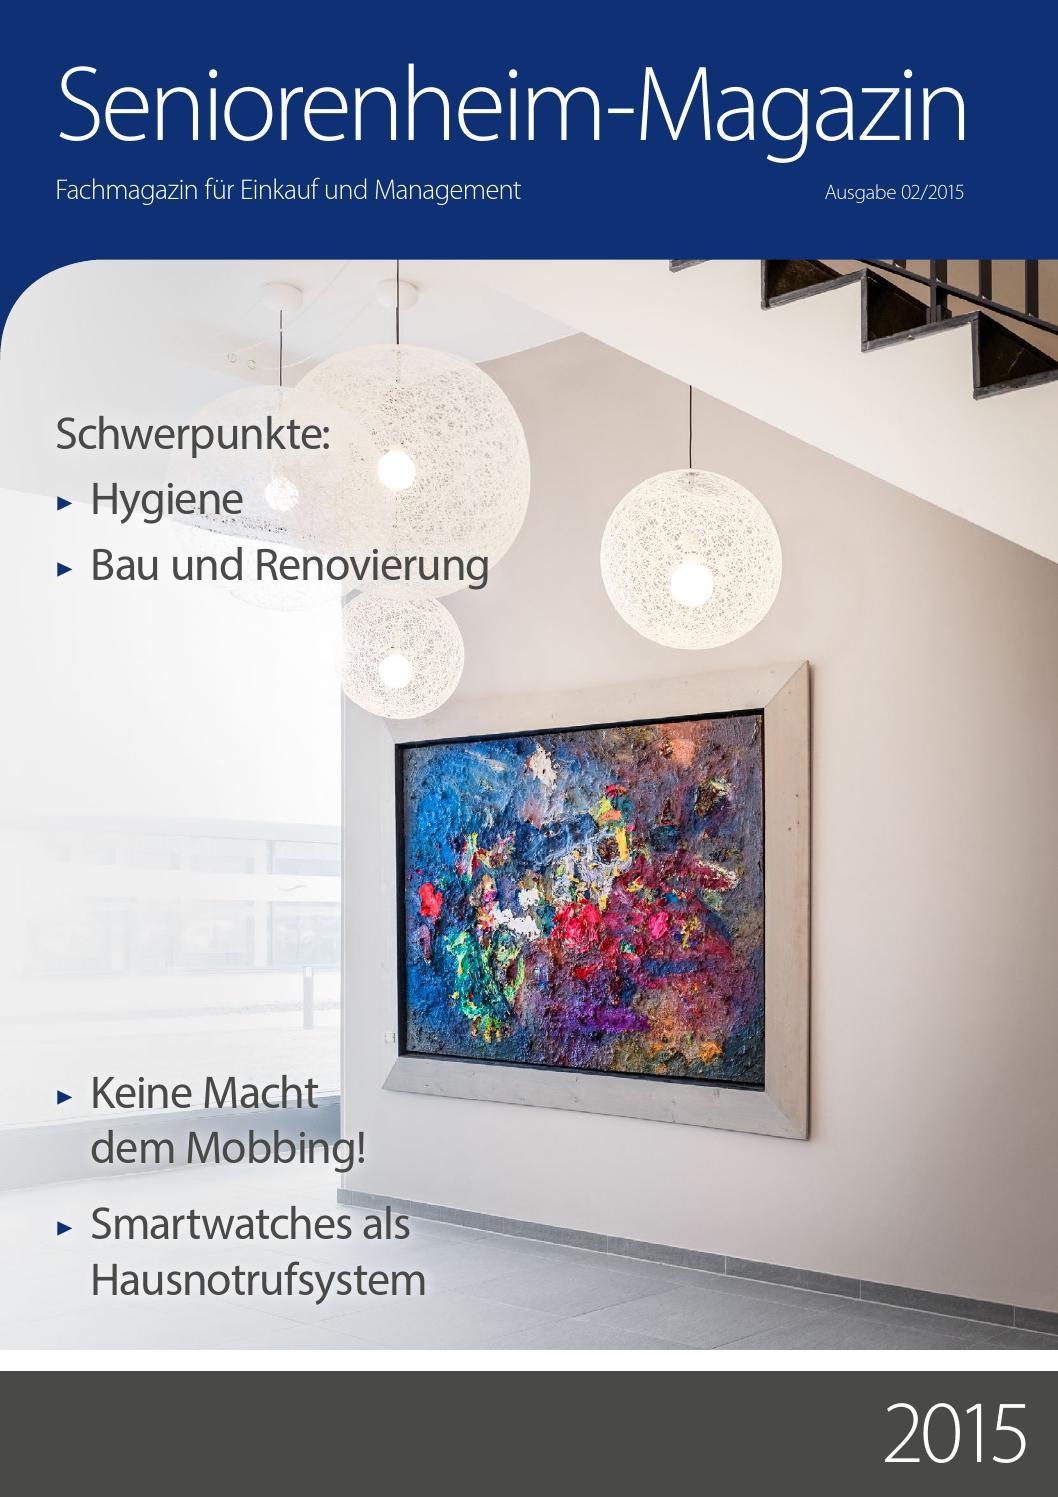 Seniorenheim-Magazin Ausgabe 02/2015 by Eiers Media - issuu